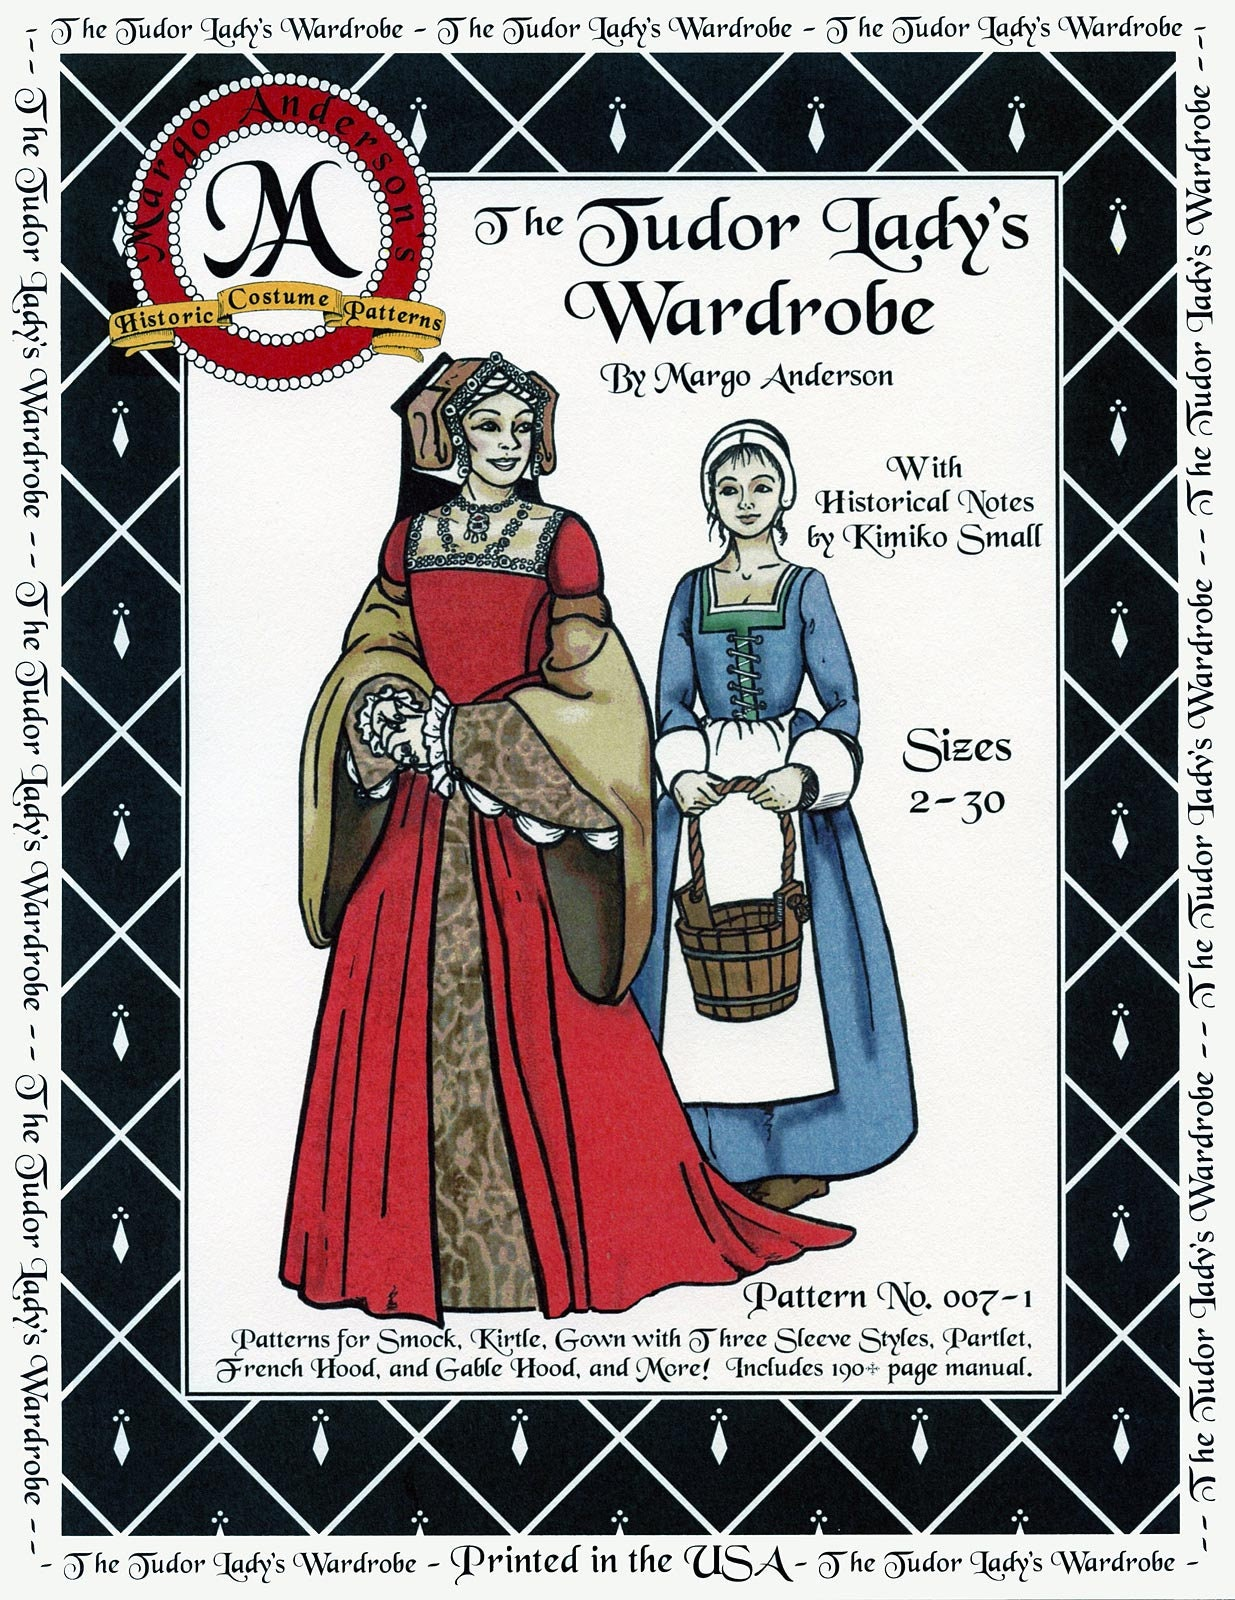 Tudor Lady's Wardrobe Gown, Cap, Smock, Apron Costume